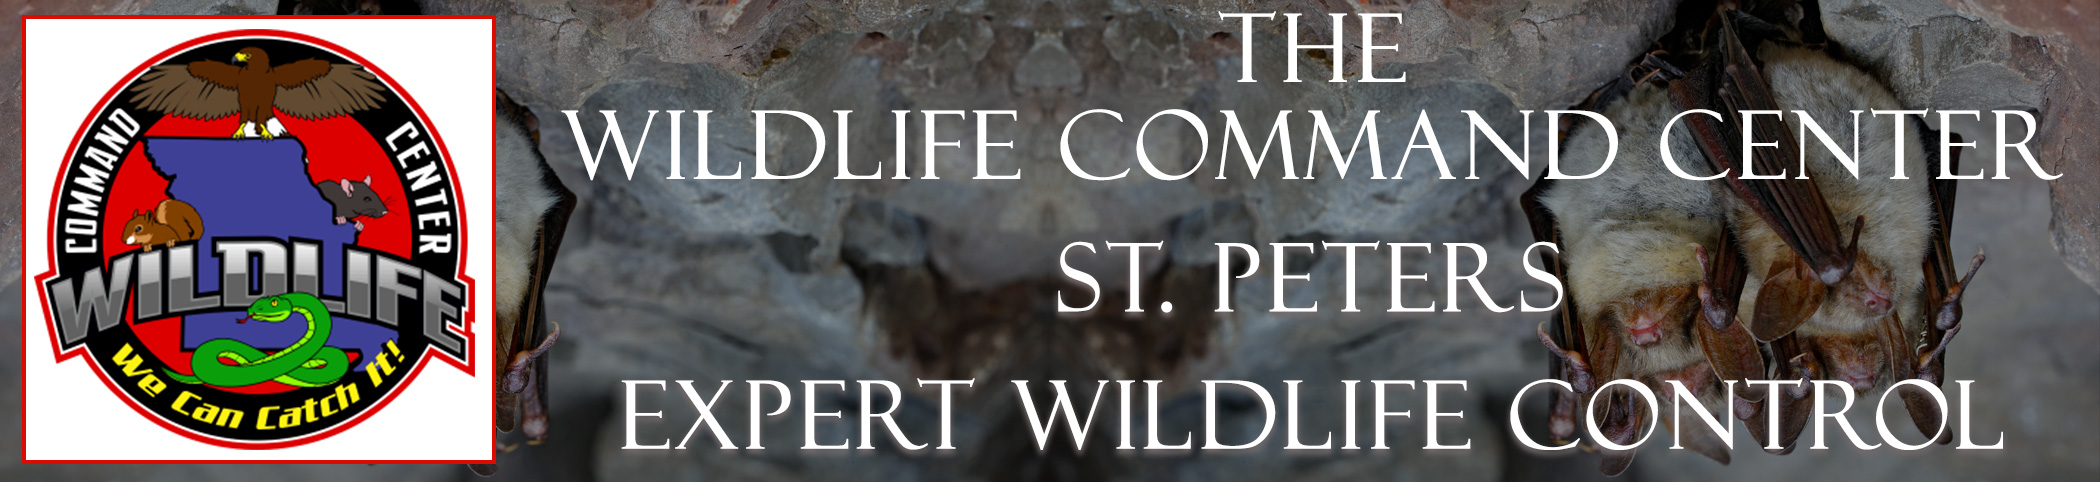 The Wildlife Command Center St. Peters Missouri Image